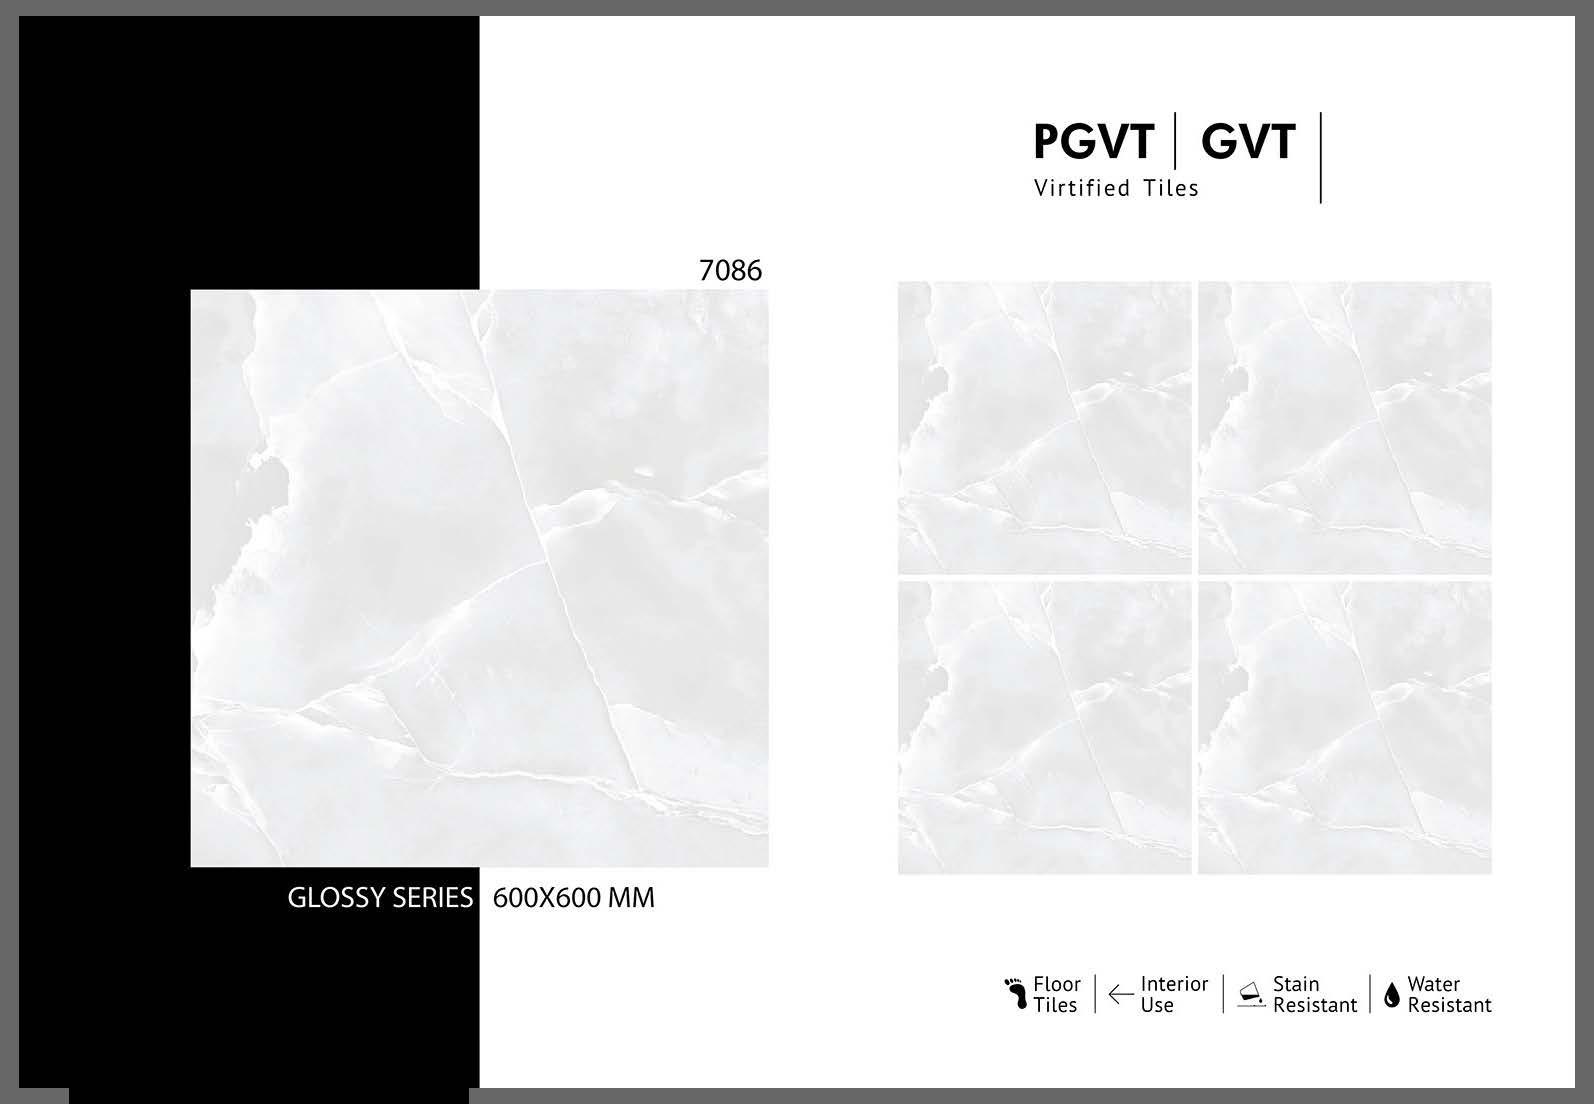 GVT 2X2 GLOSSY_Page_73.jpg